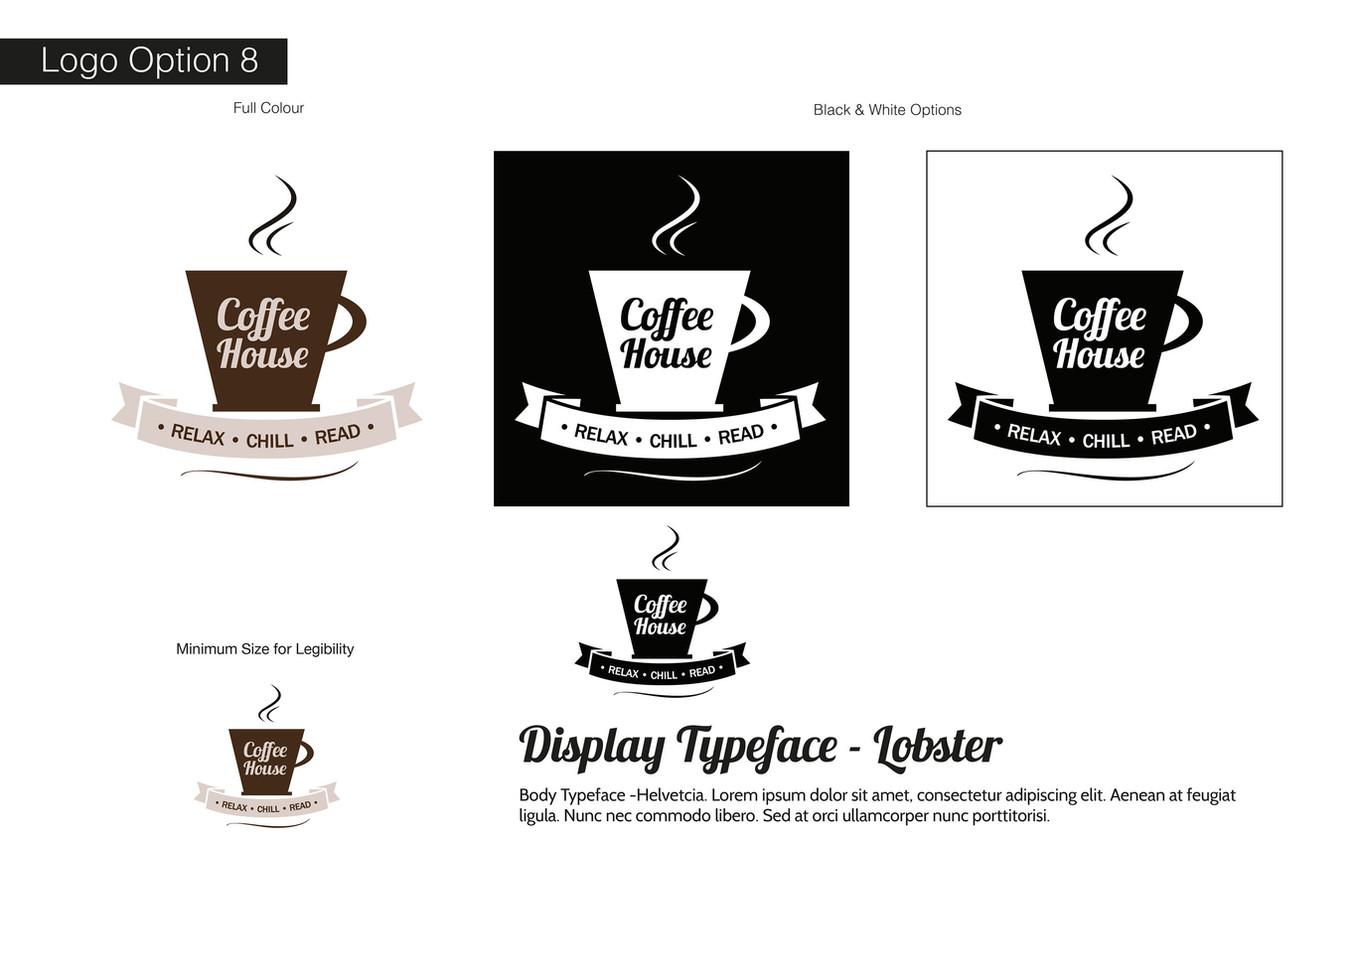 Coffee House Visual Identity - Development 8